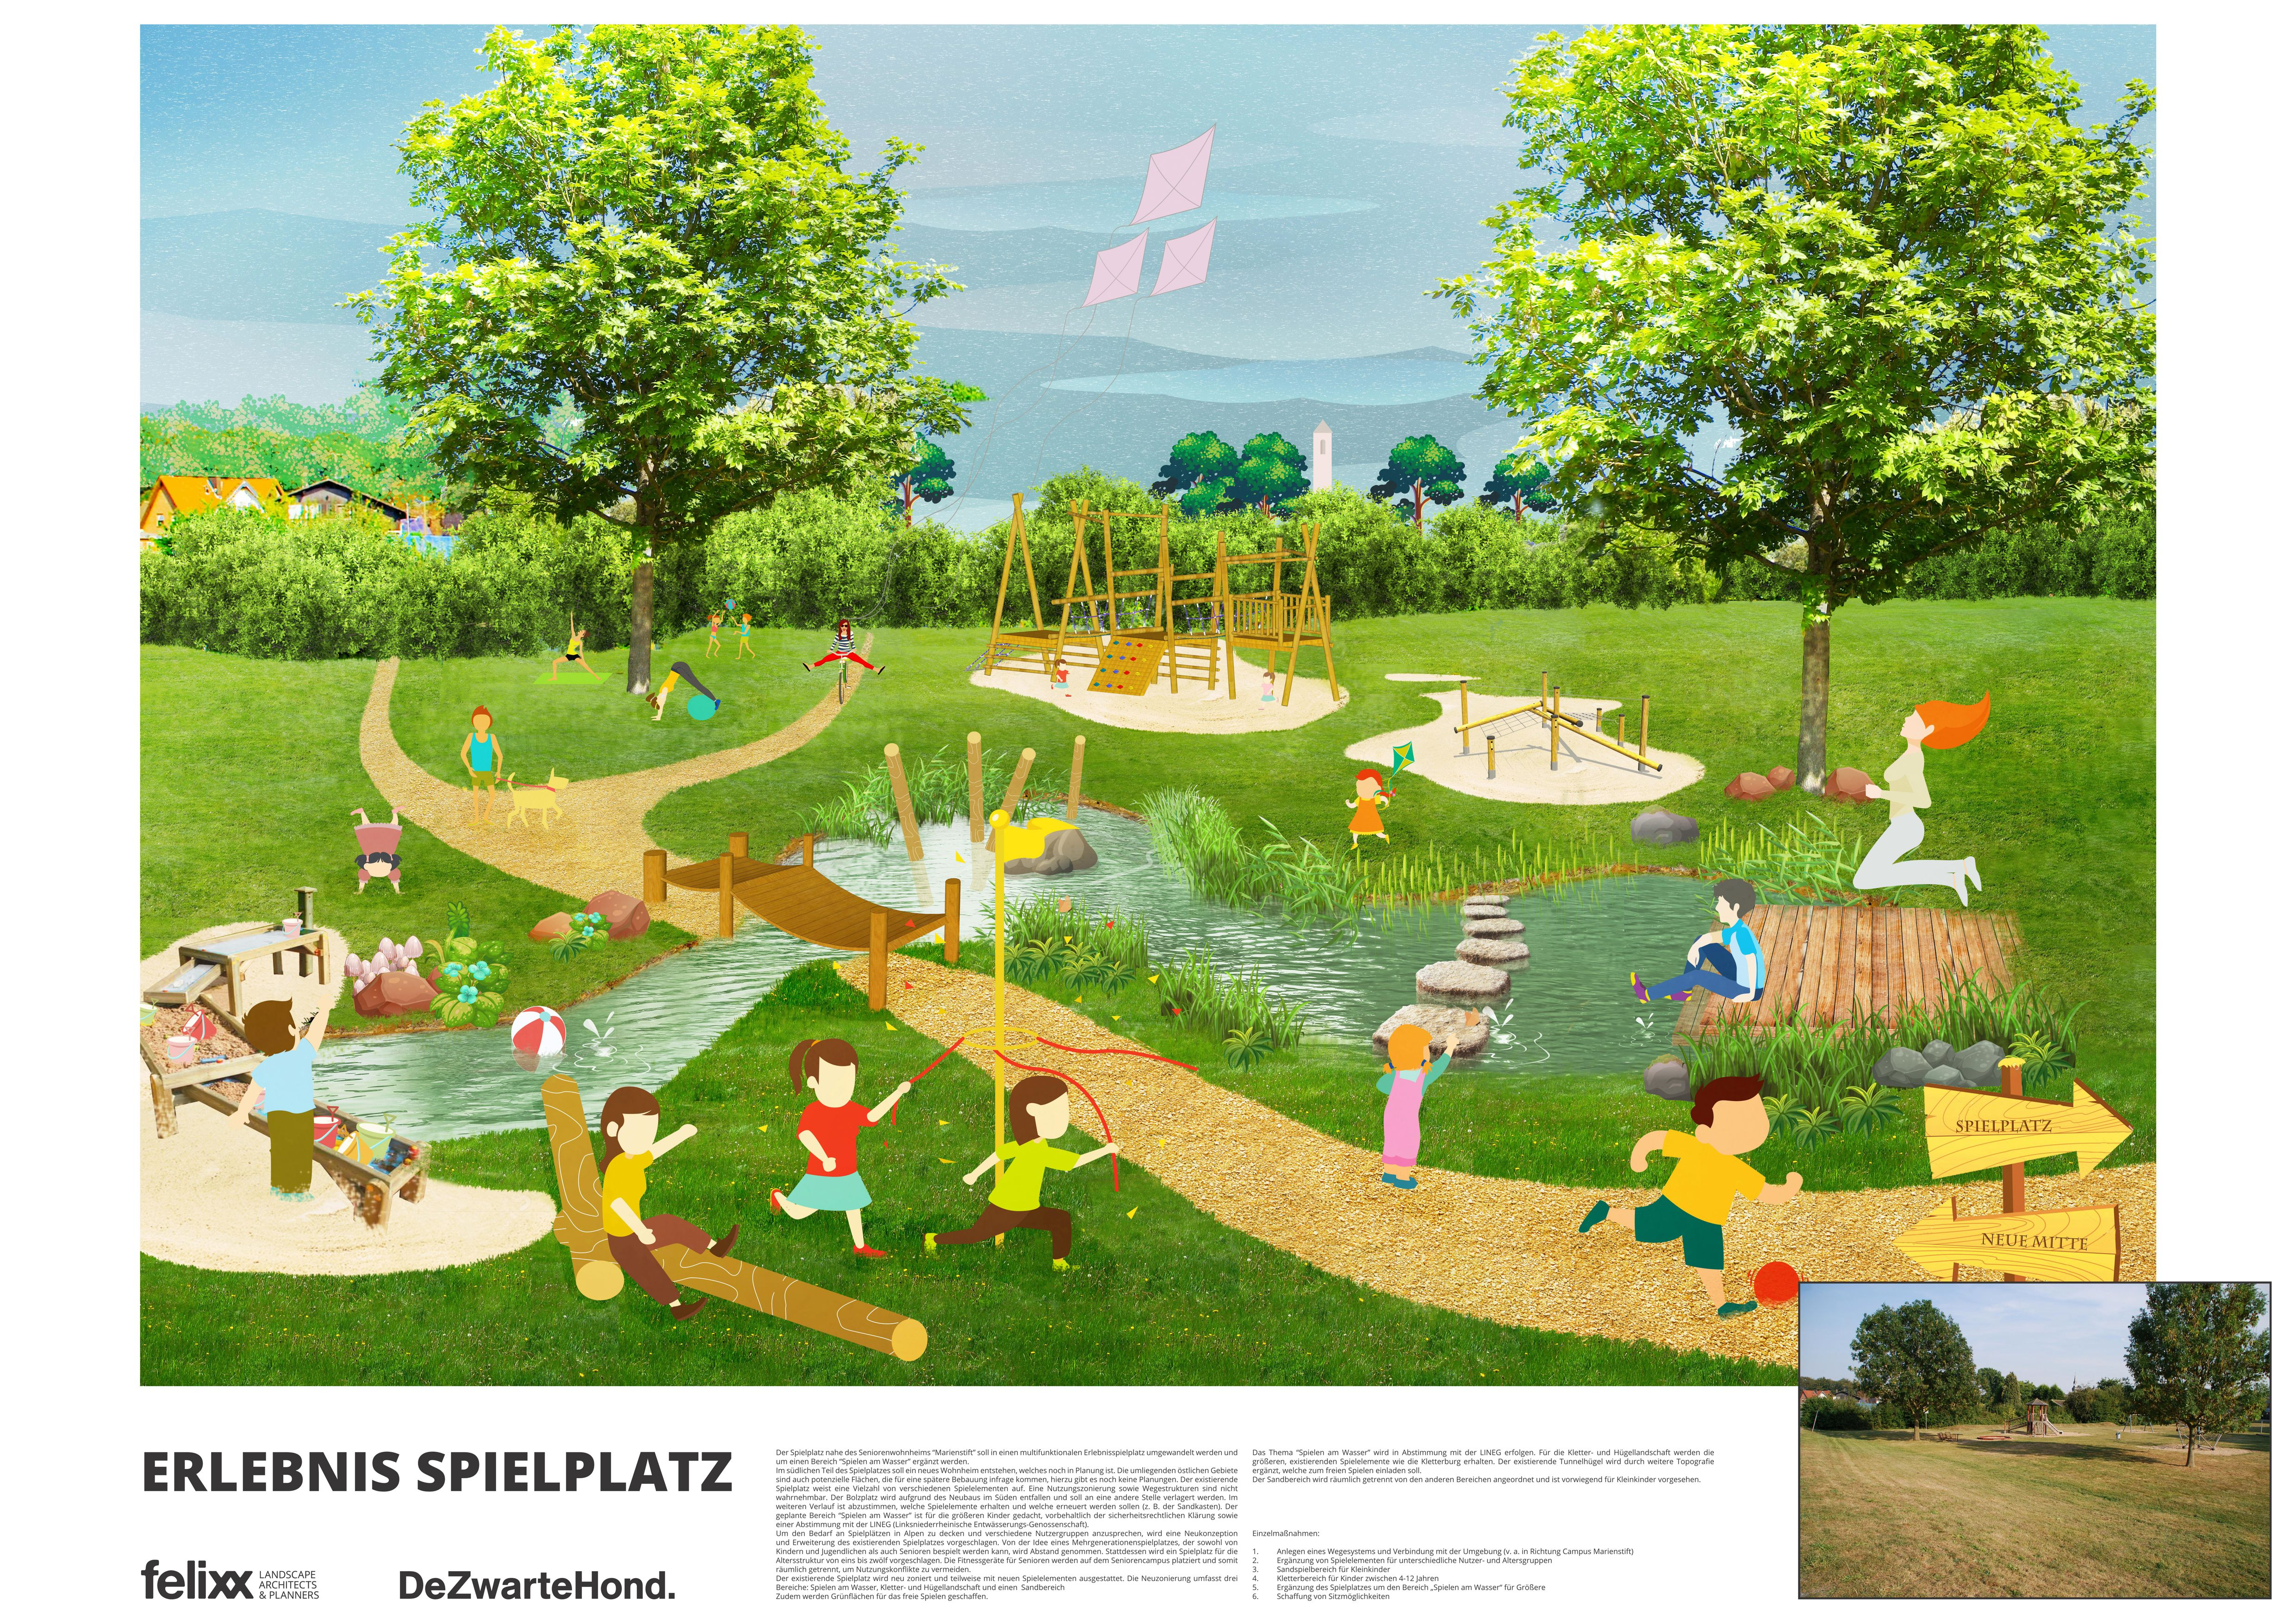 Gemeinde Alpen: Stadtumbau Alpen